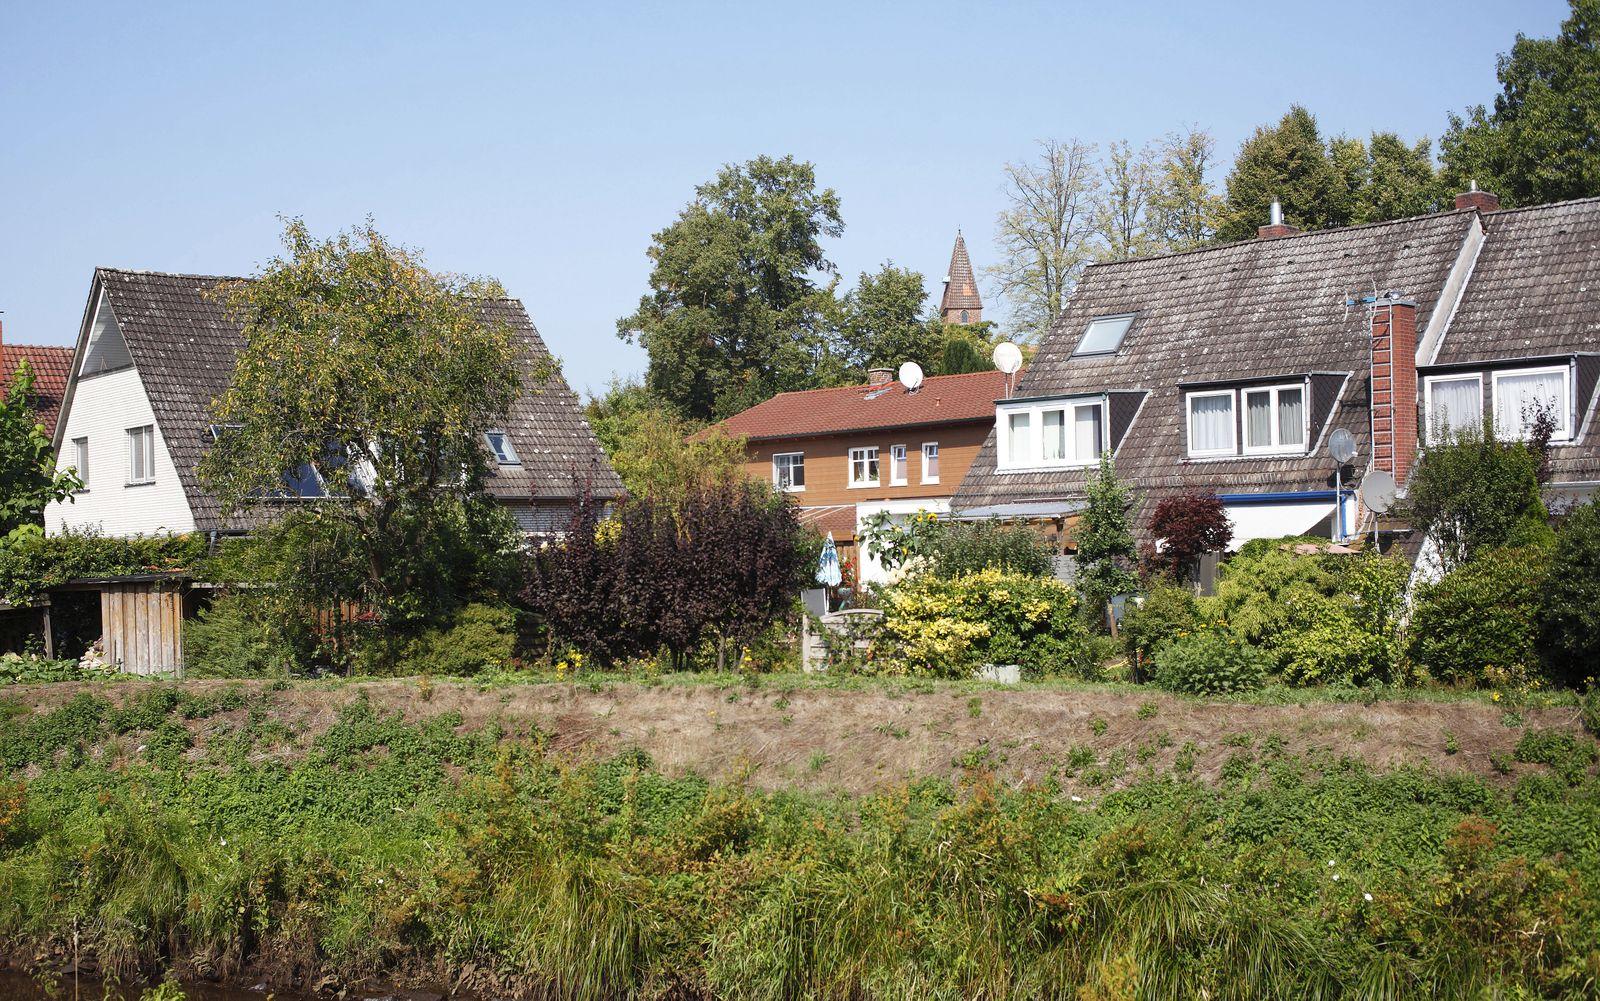 Wohnh?user am Fluss W?rpe, Lilienthal, Niedersachsen, Deutschland, Europa *** Residential buildings on the river W?rpe,